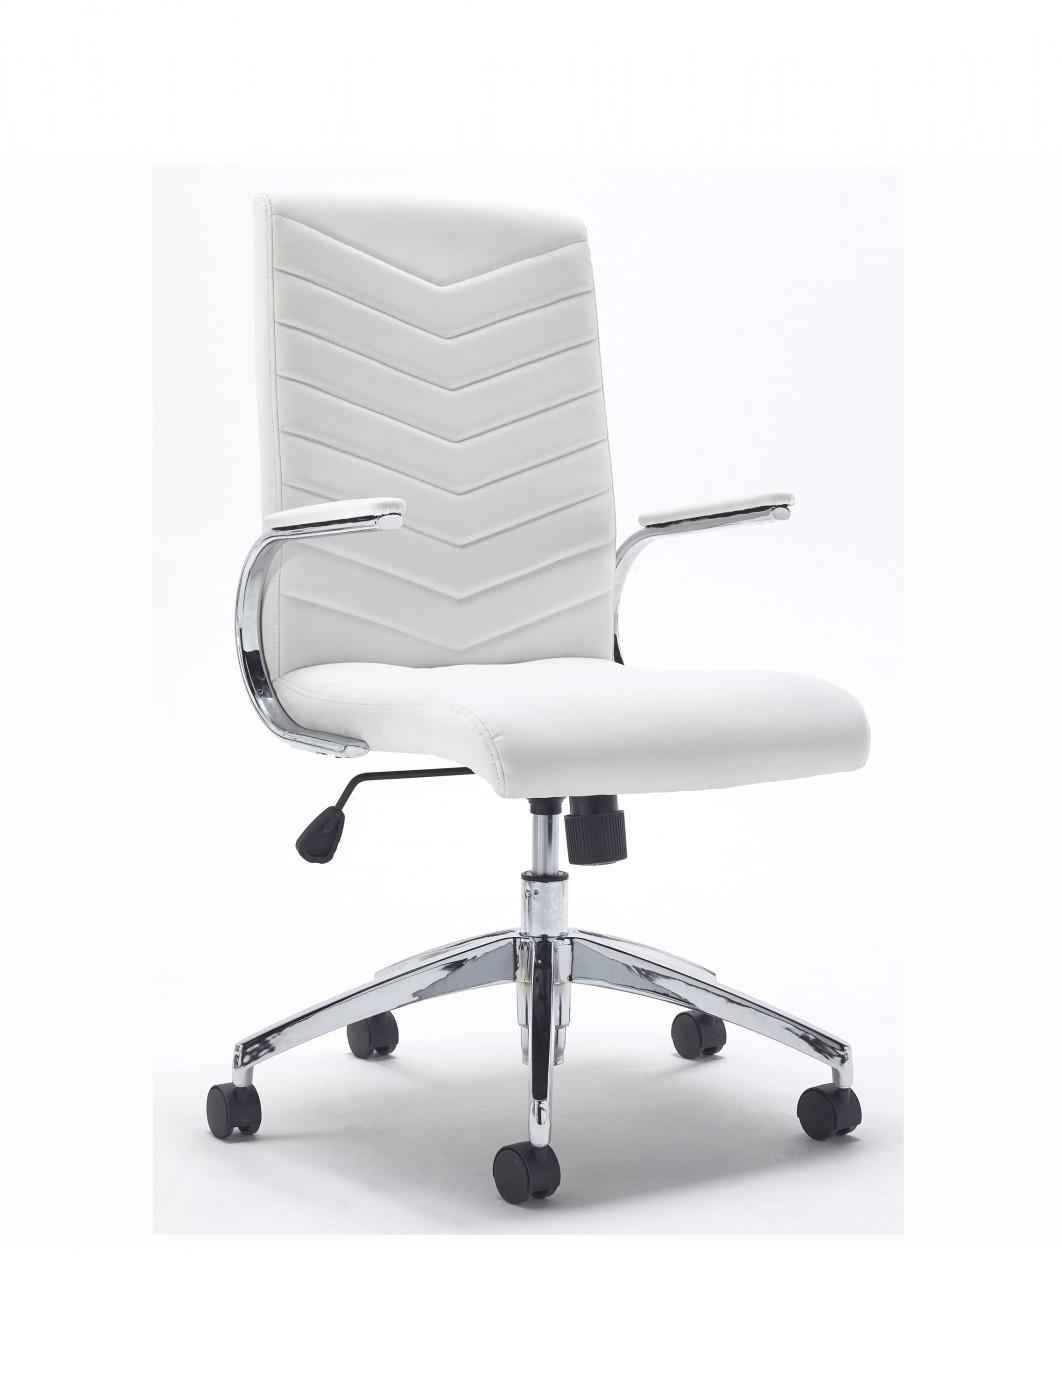 tc lite 1600mm desk pedestal and baresi chair bundle white 121